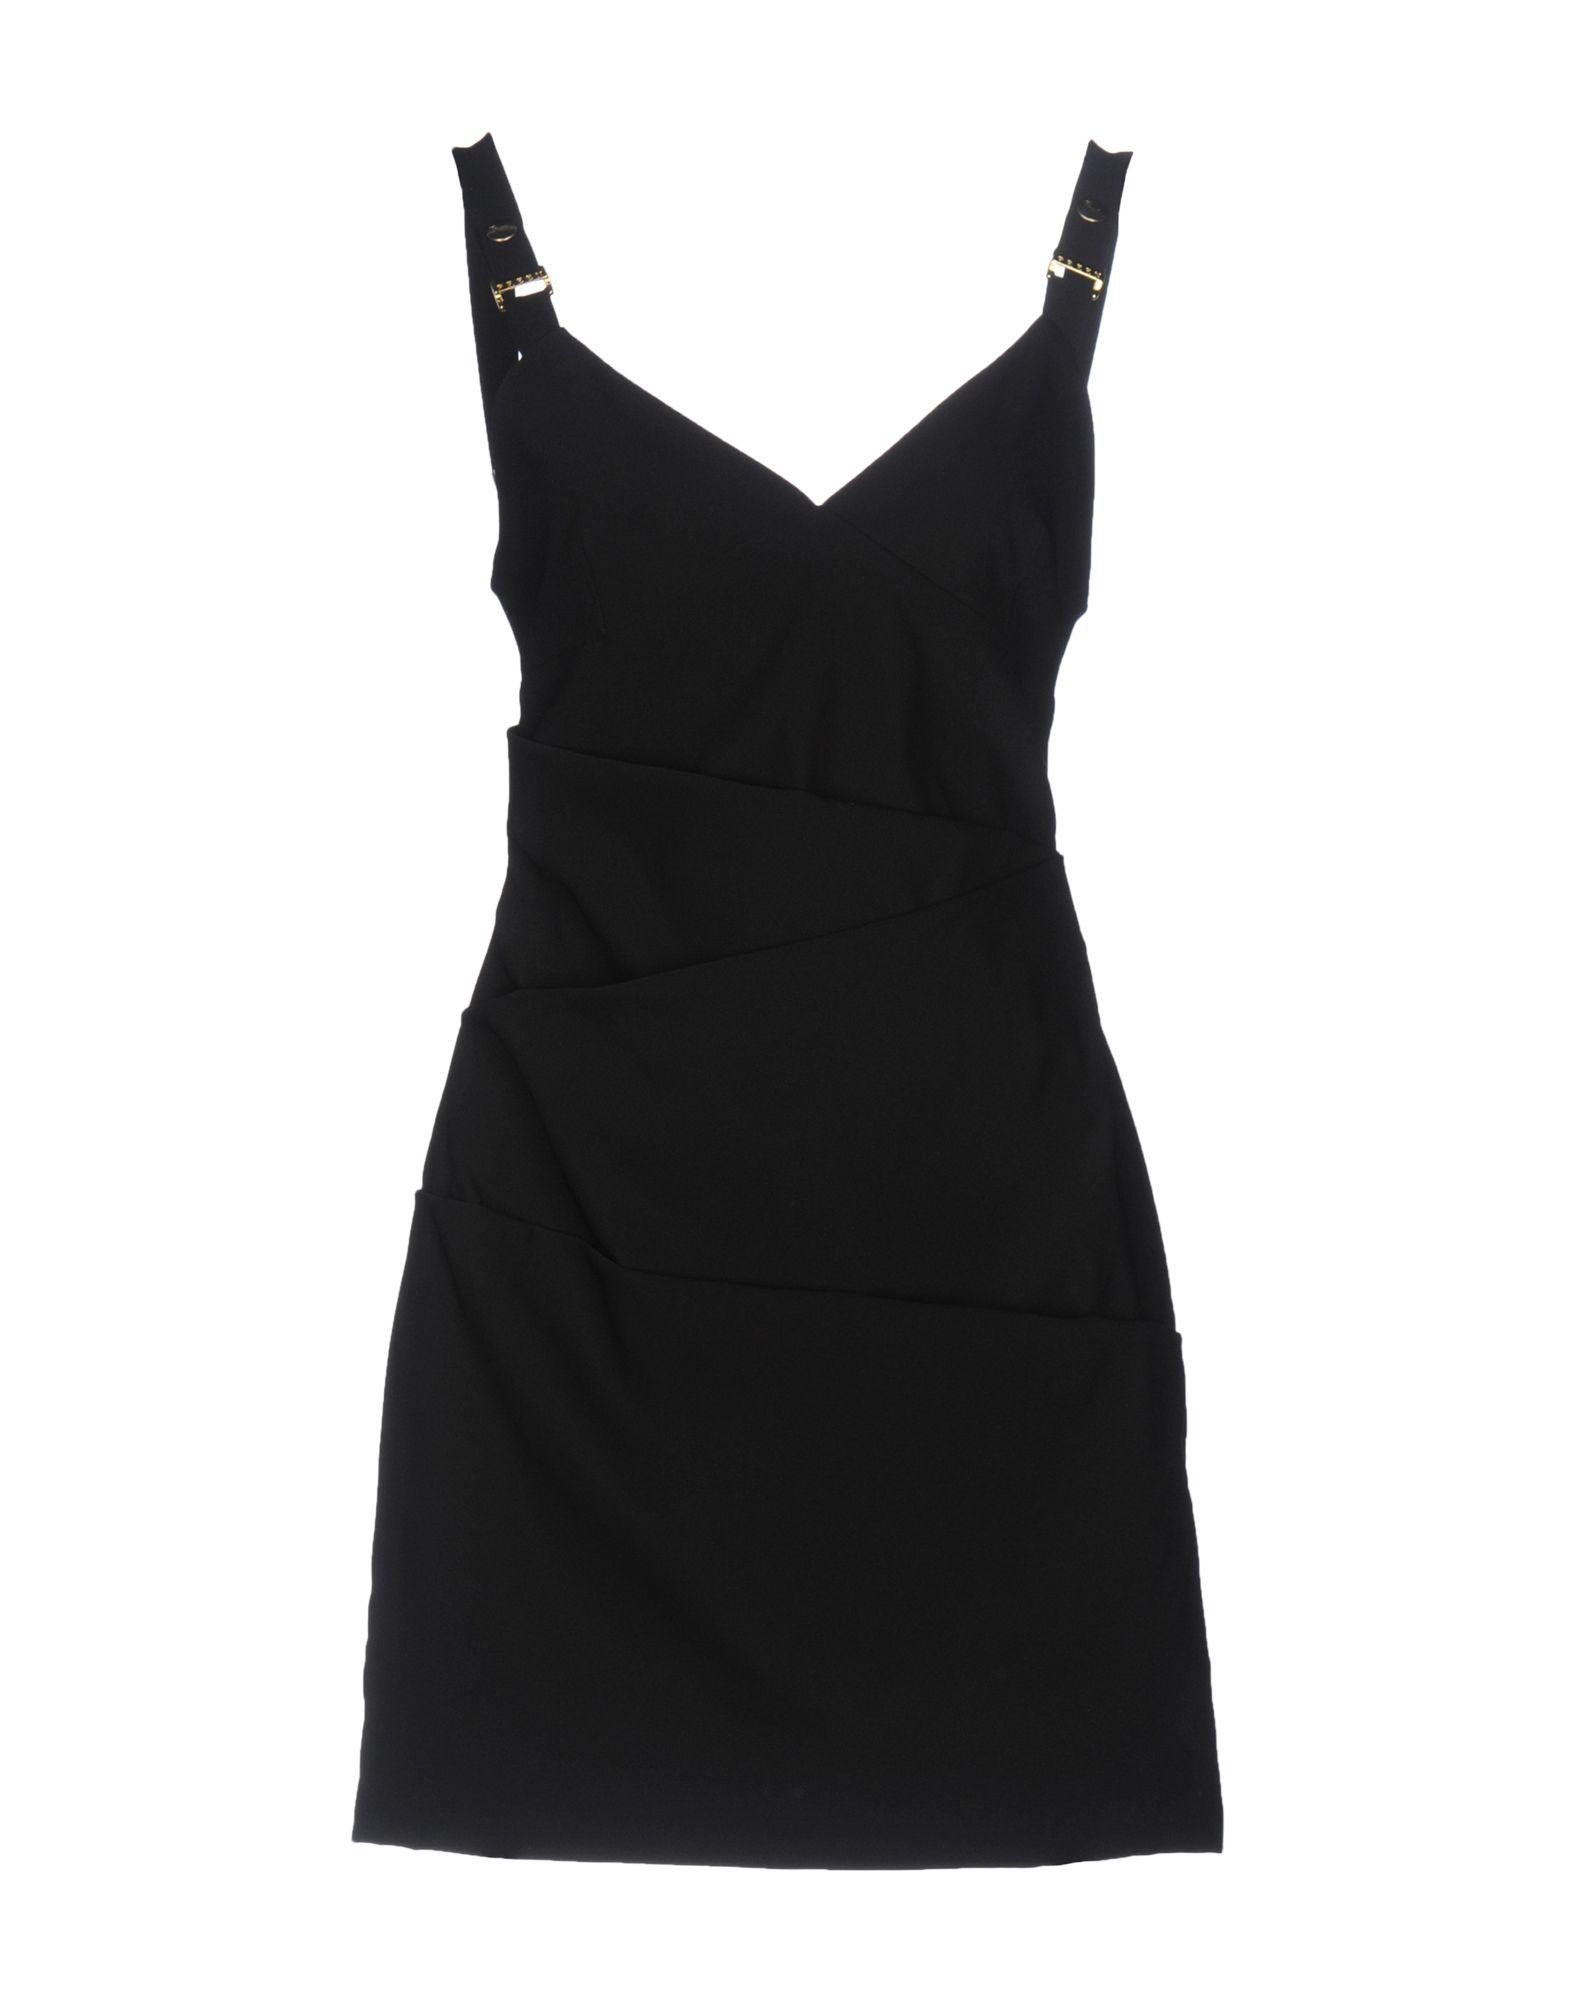 платье preen платье PREEN by THORNTON BREGAZZI Короткое платье